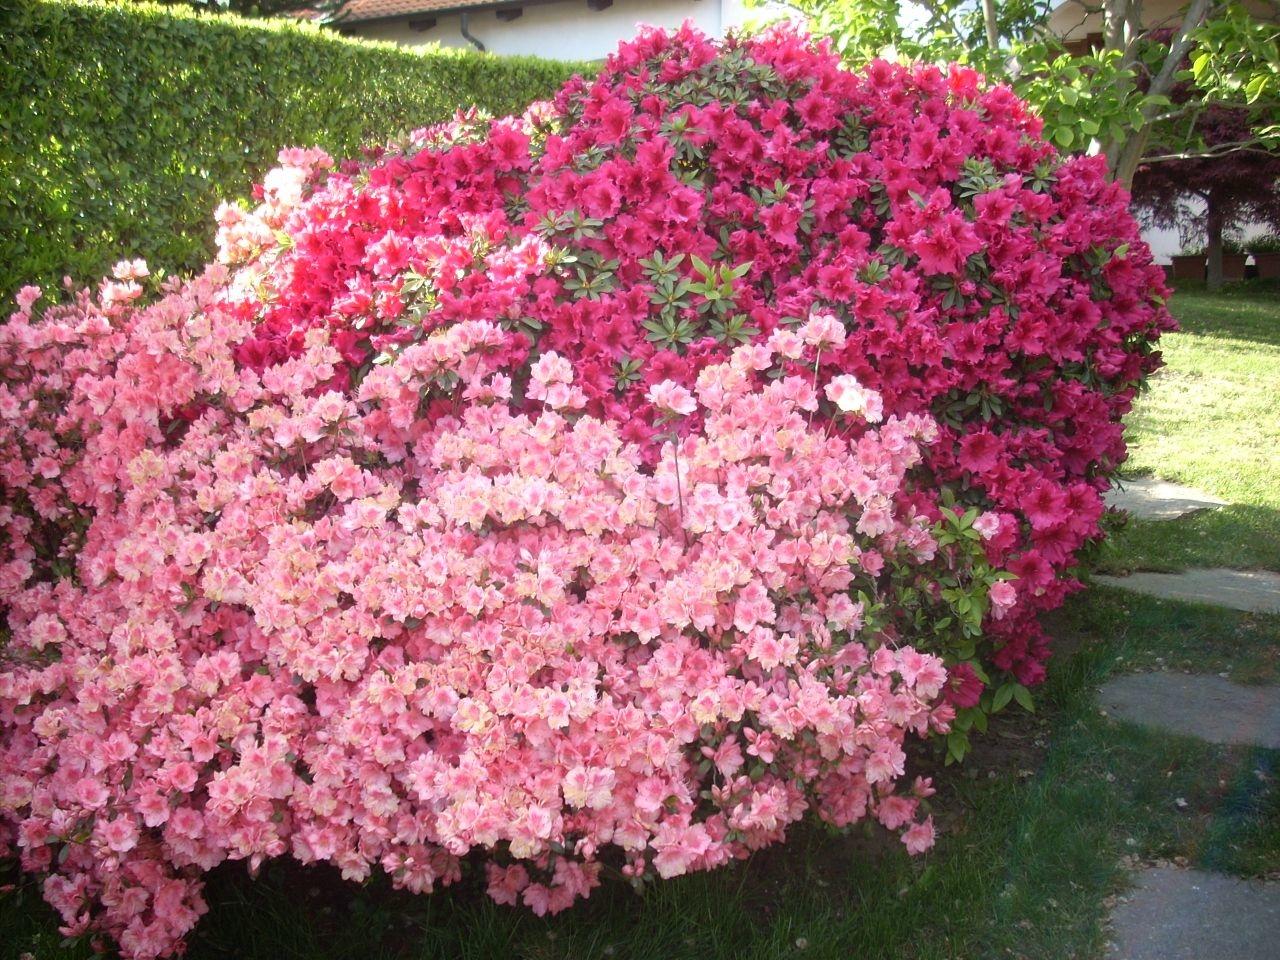 Azalea cure naturali fai da te terra nuova for Cespugli sempreverdi fioriti